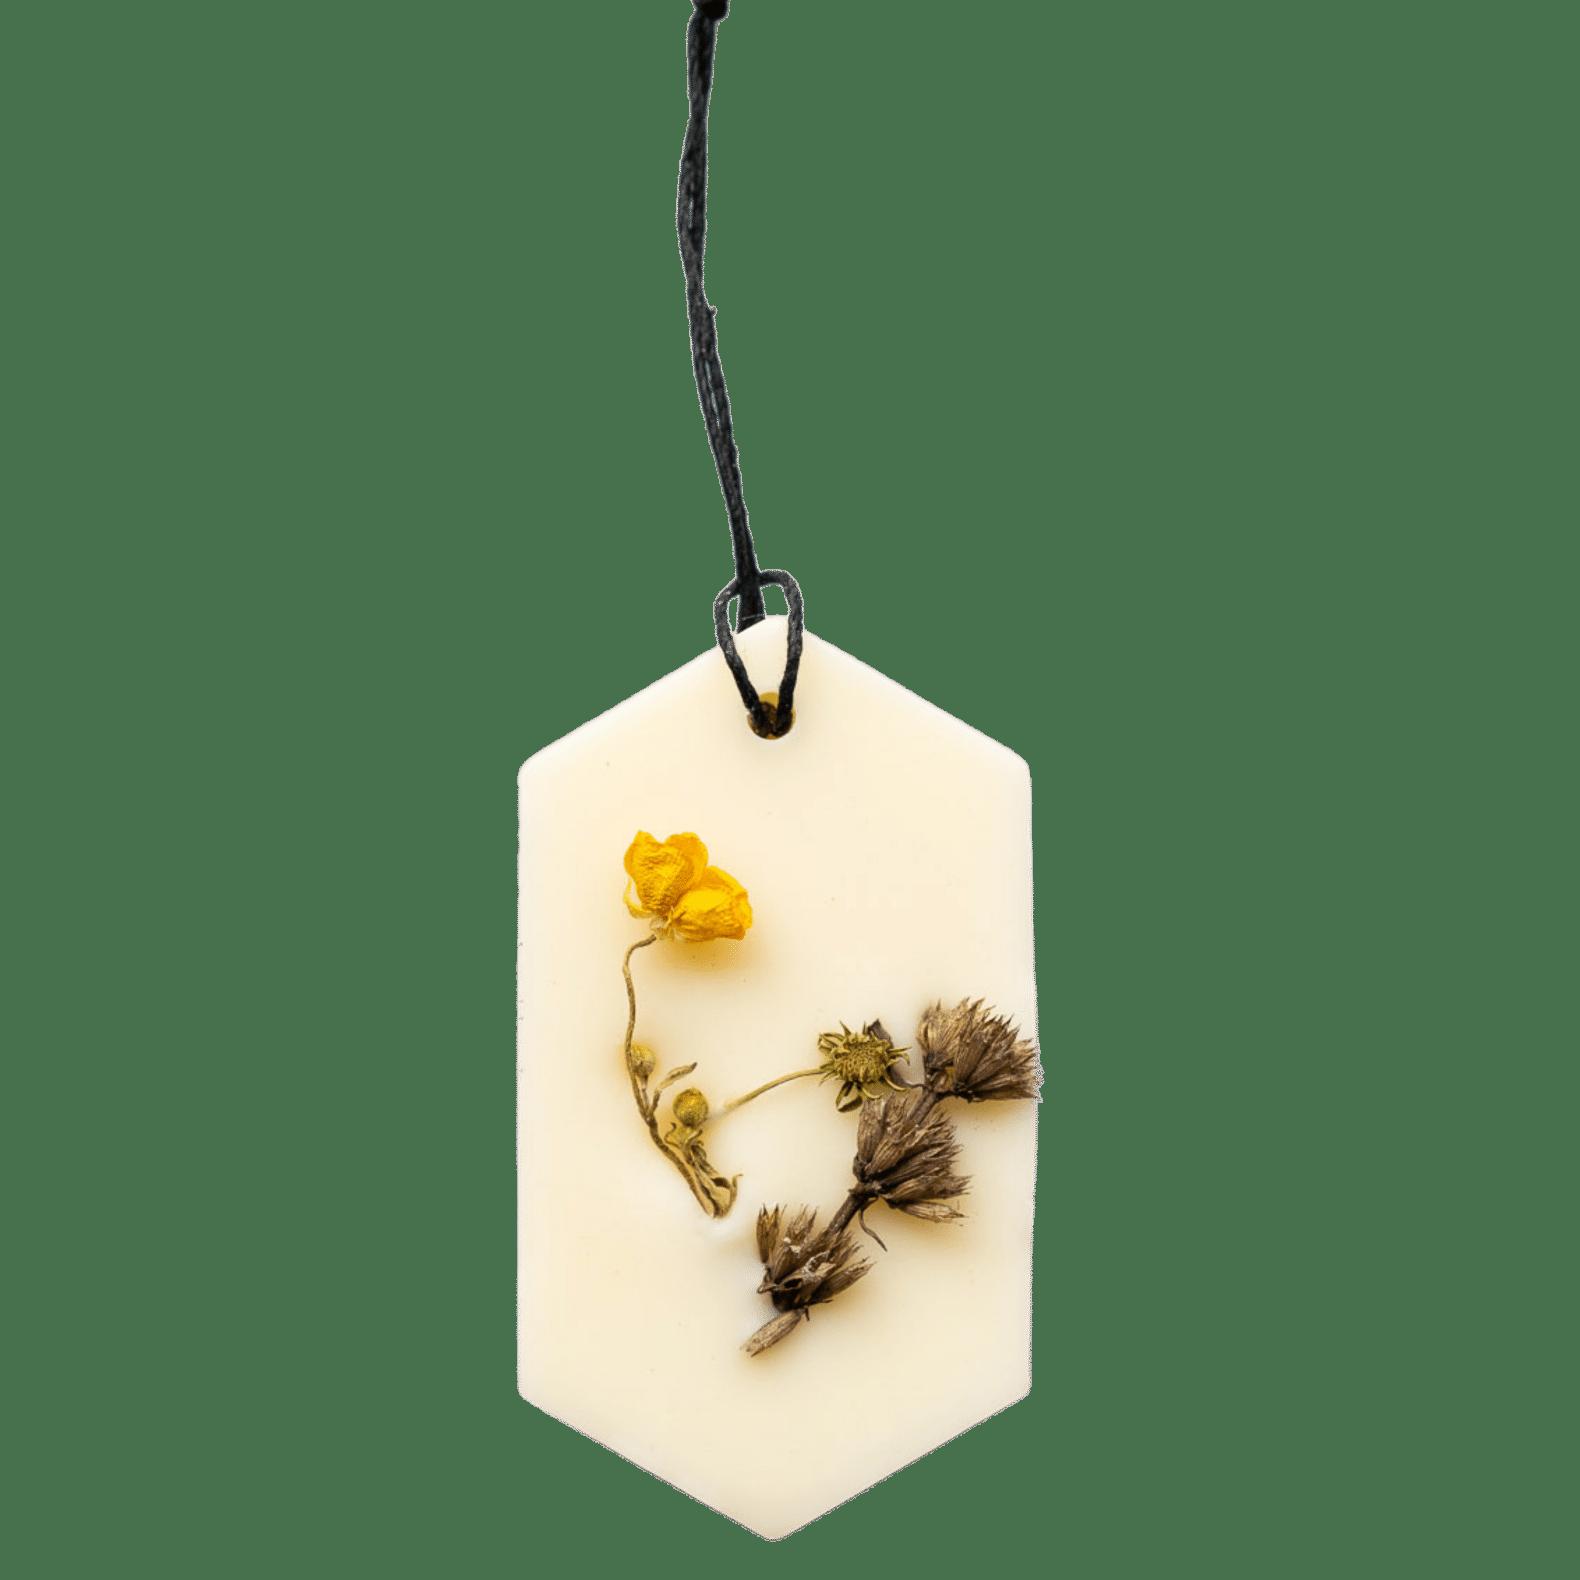 Mythyn - Botanical Scented Wax Tablets - Lemongrass Cedarwood